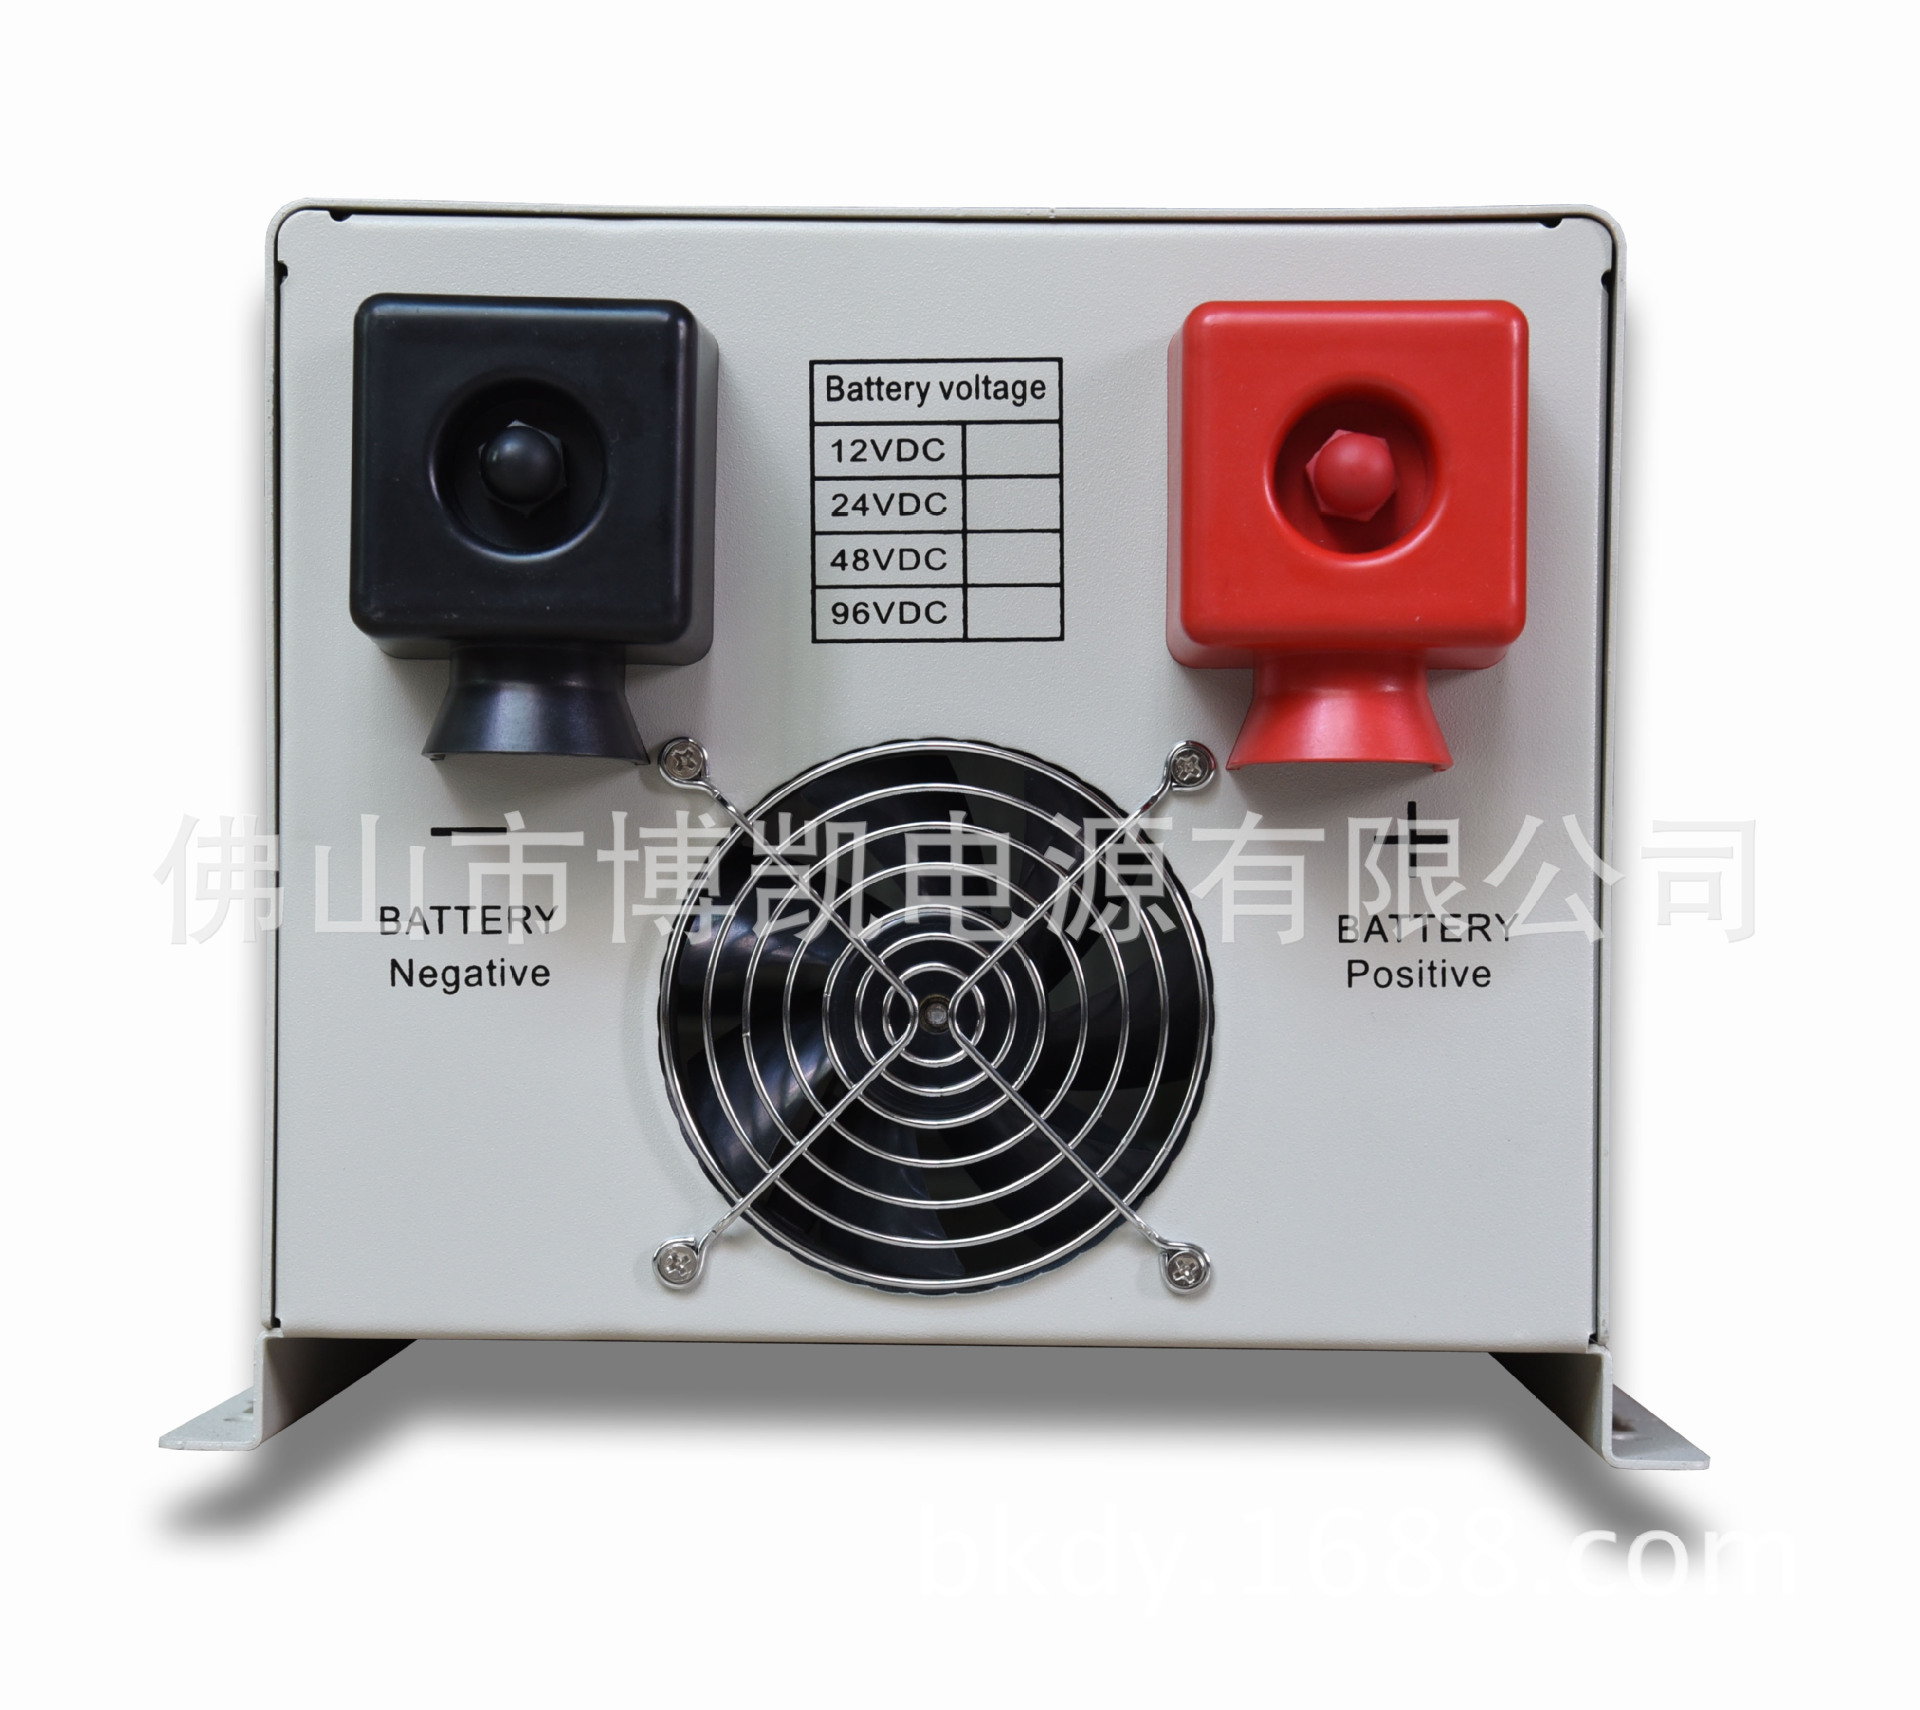 2kw24v转220vups逆变器 充电电流多档可自选ups逆变器